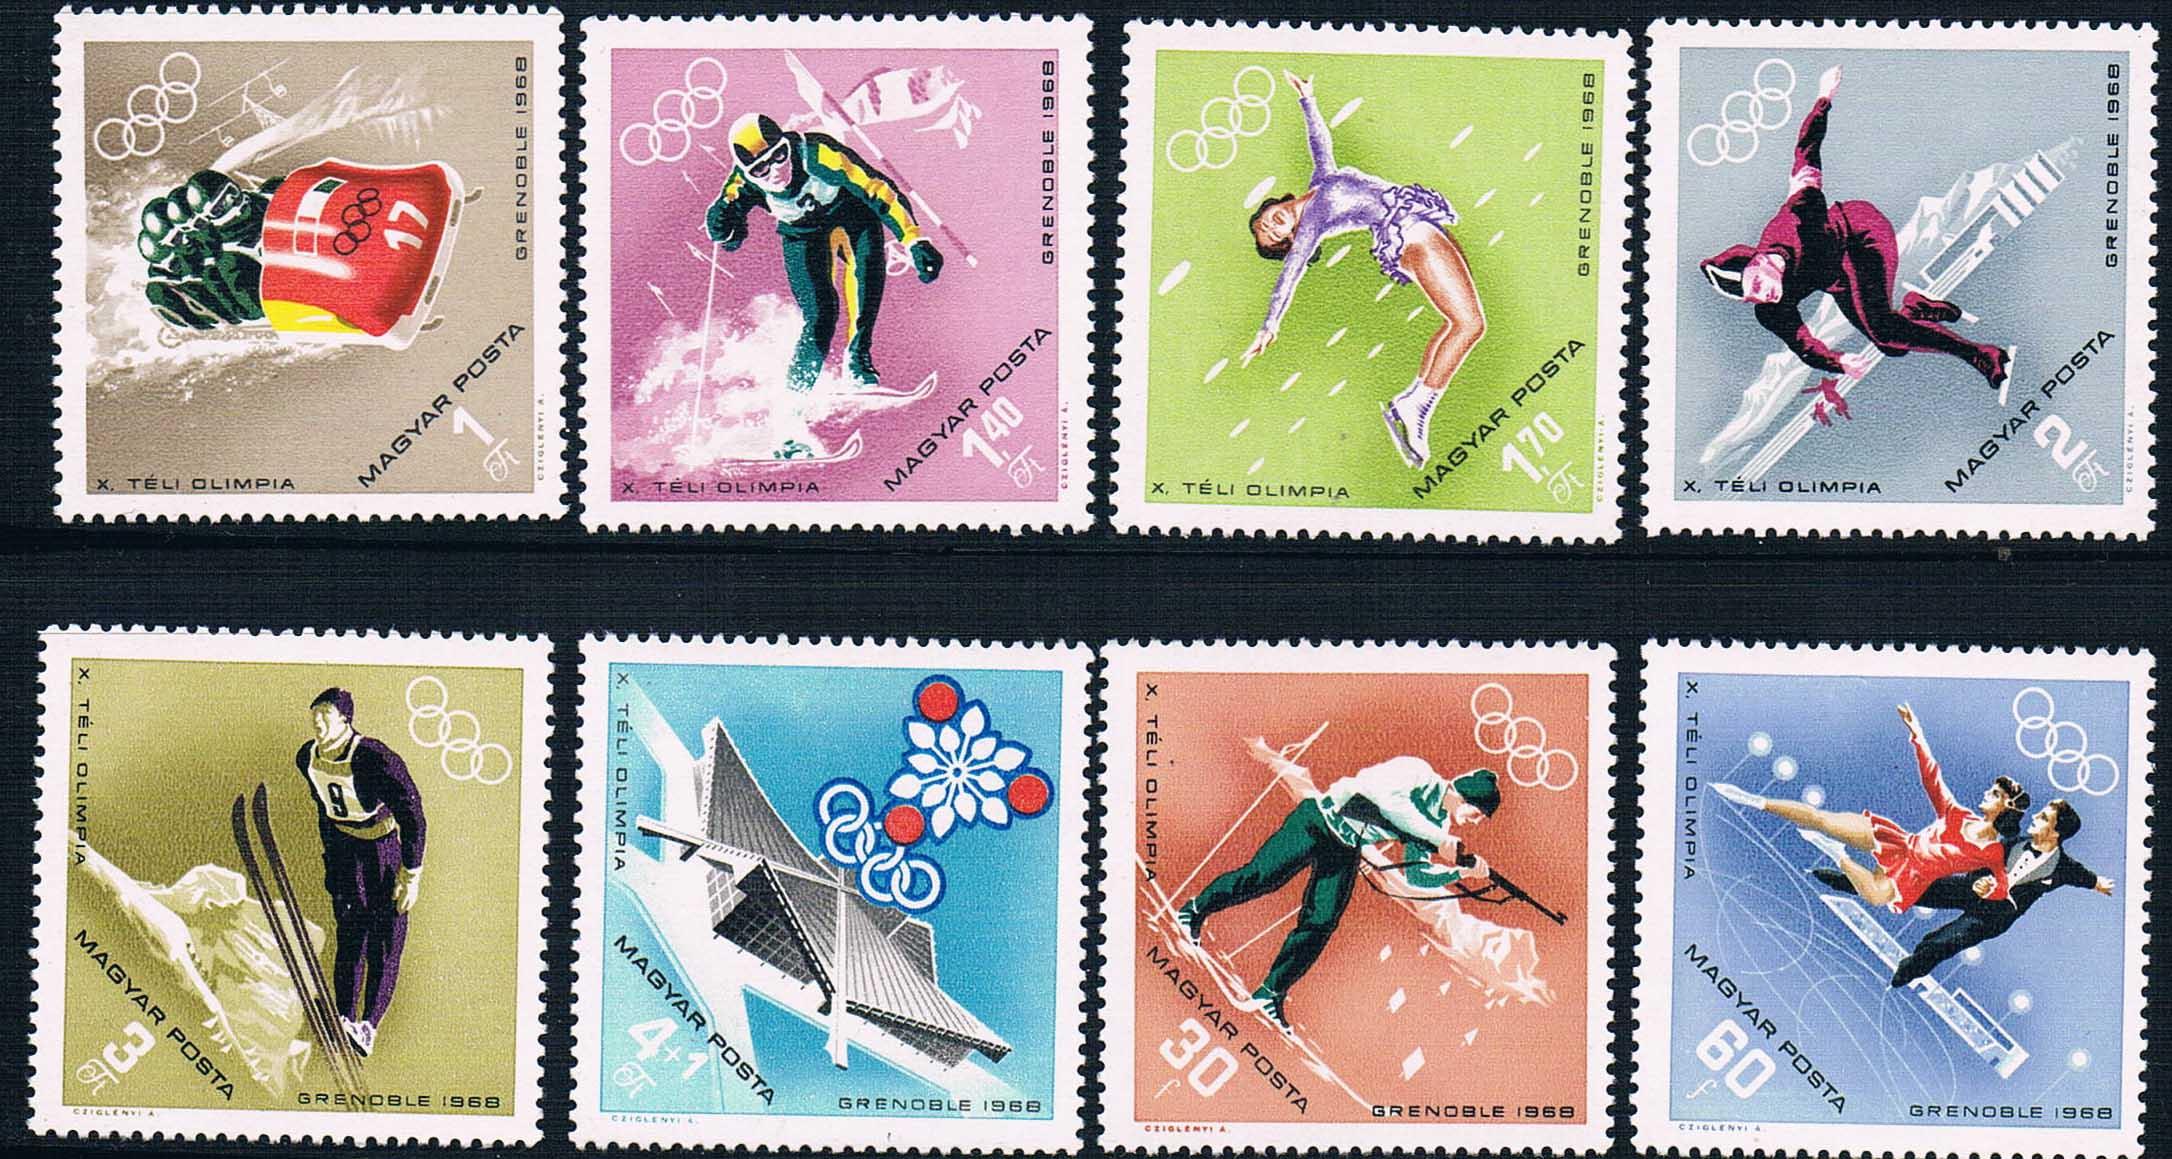 H0121 Hungary 1968 Winter Olympics 8 NEW premiumx 1 43 yuan bao 1968 volvo 164 rich 164 alloy models prd247